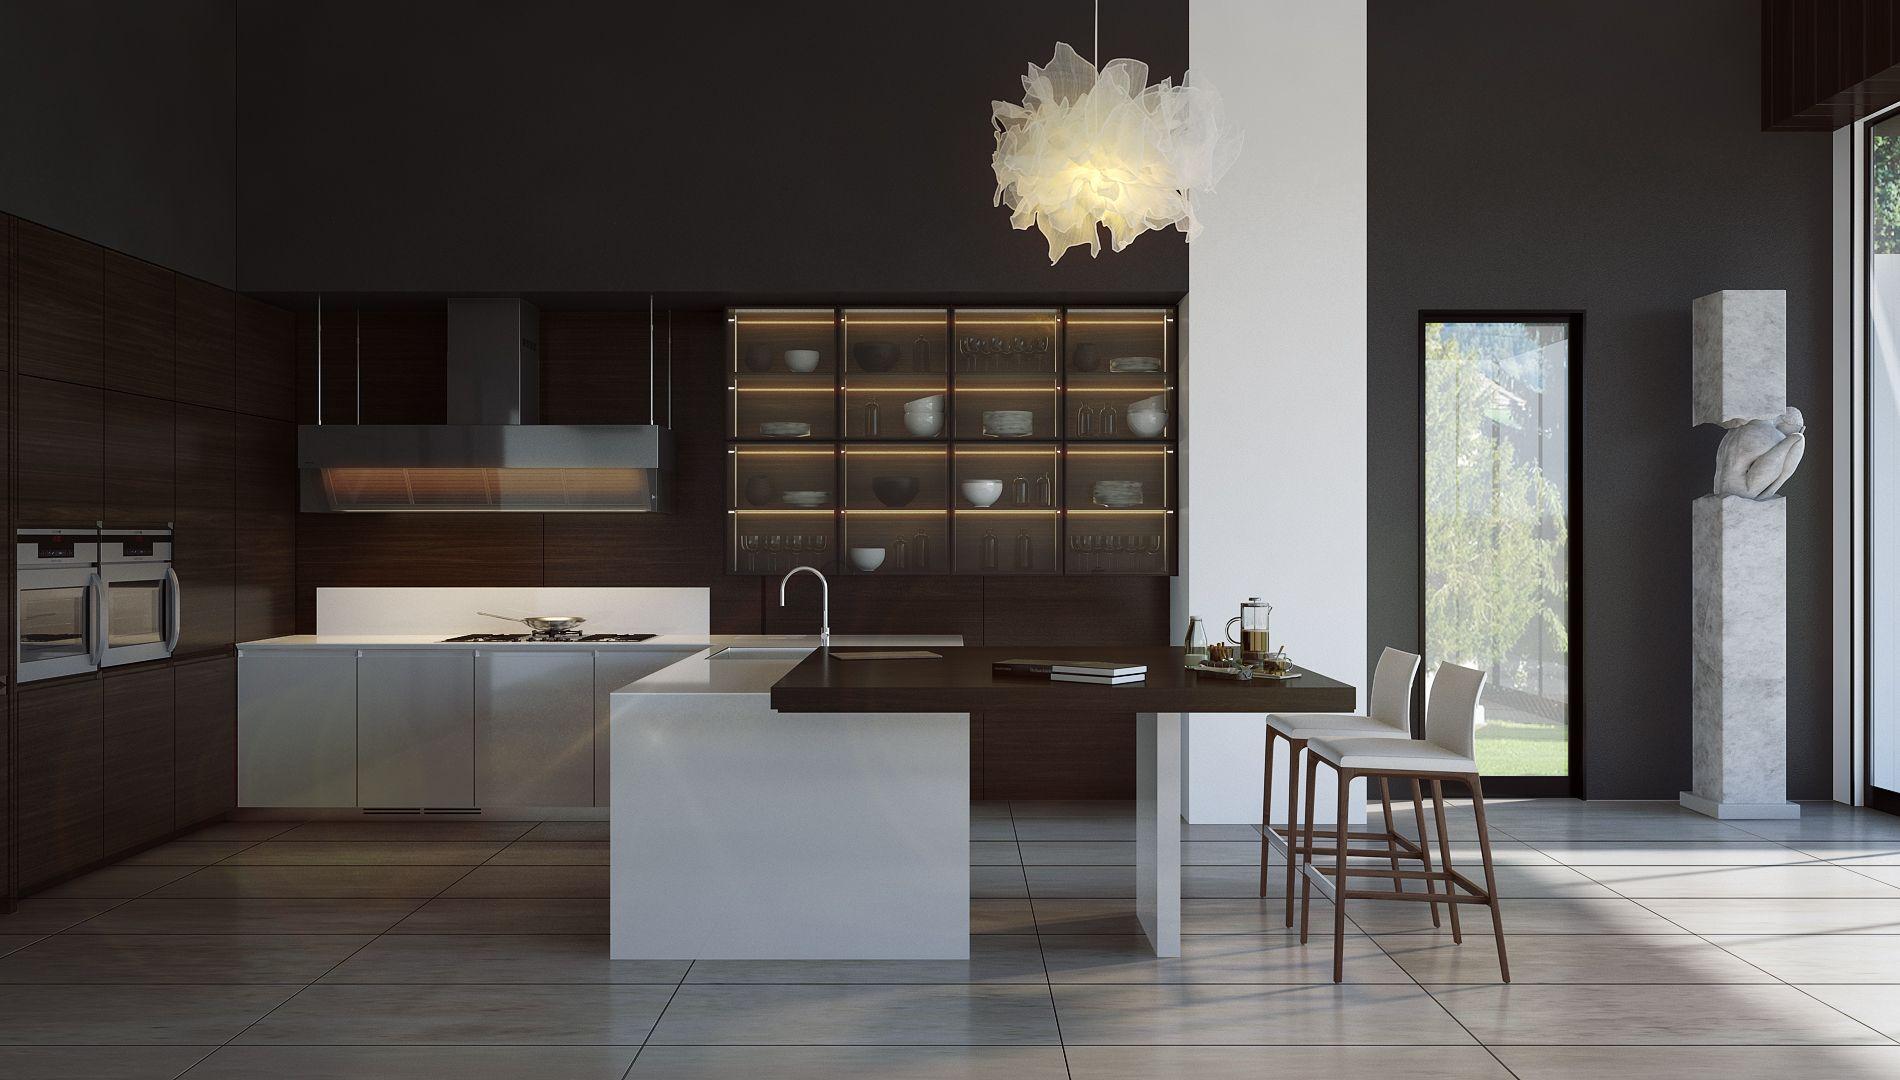 Modern Kitchen Poliform Modern Kitchen Poliform Modern Kitchen Interiors Kitchen Interior Design Modern Modern Kitchen Design